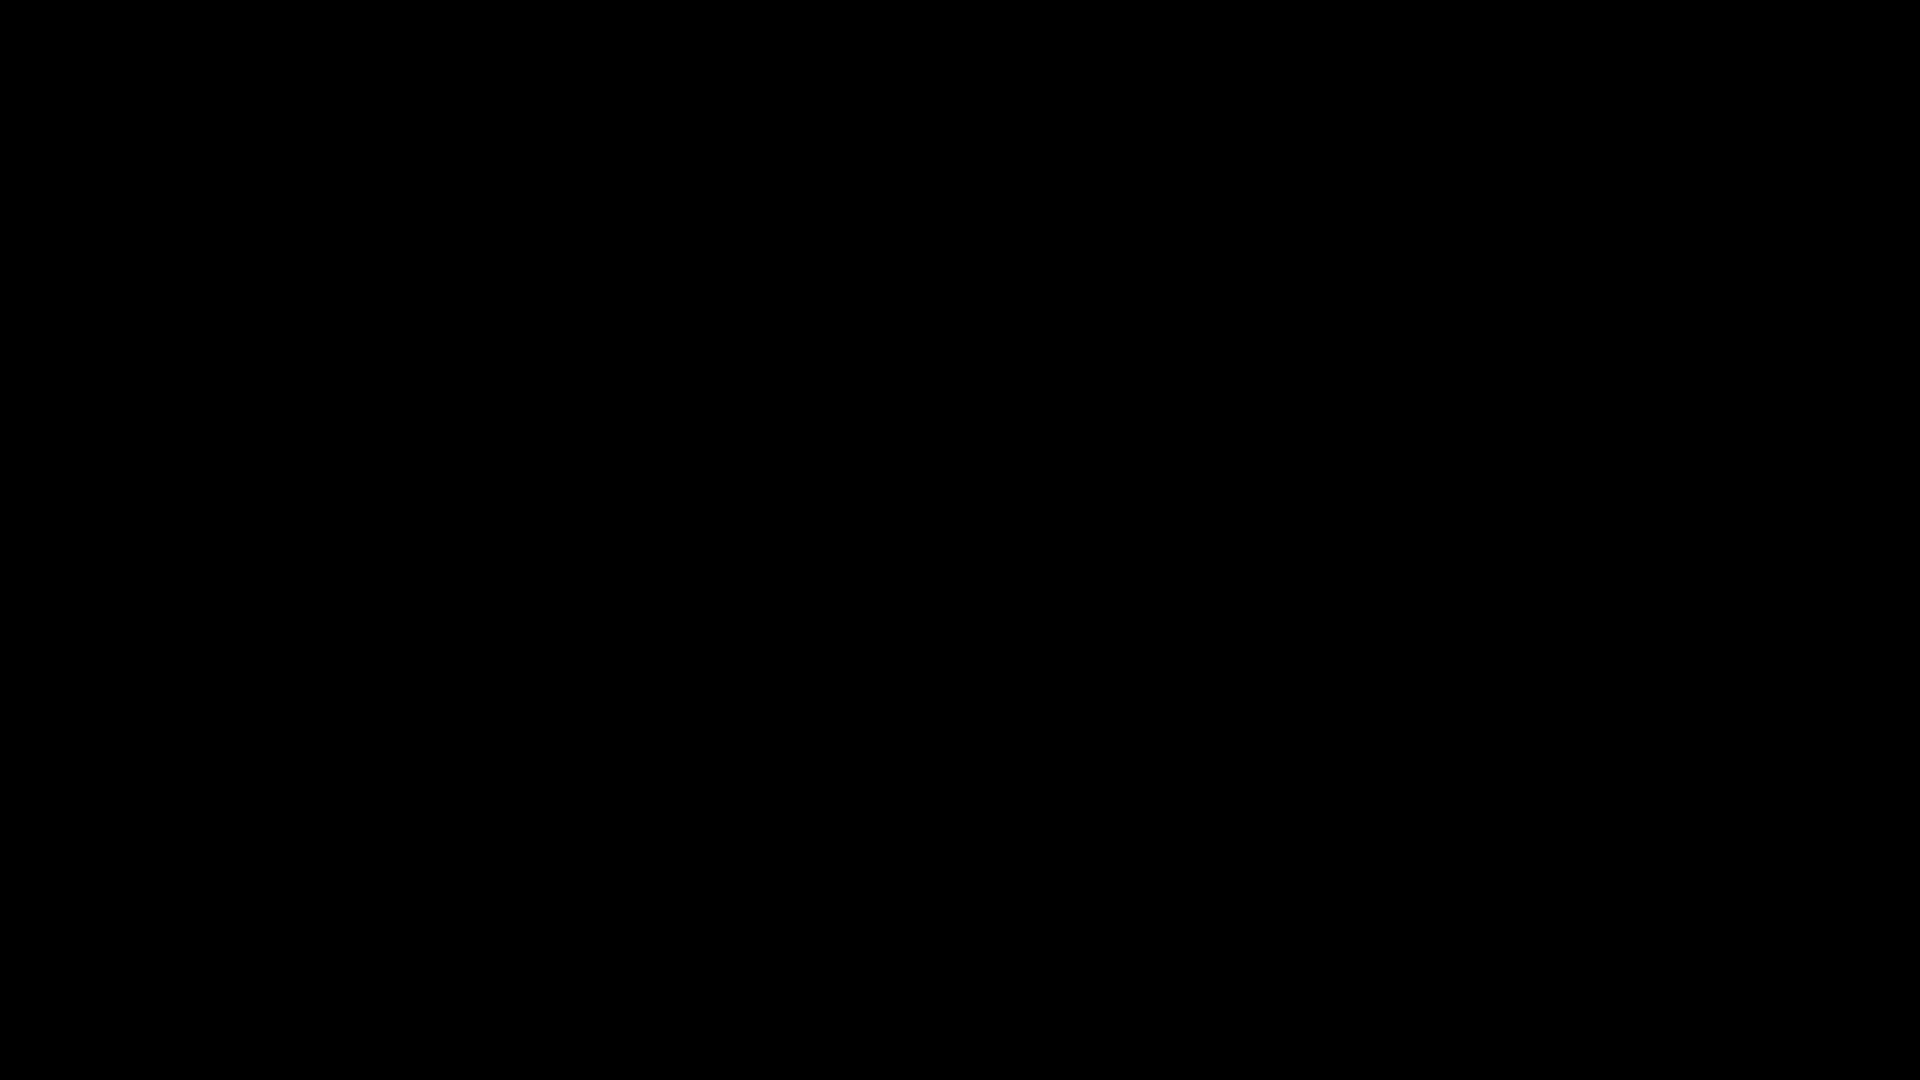 PALOMA PRADAL AUX ENCHANTEUSES 2018